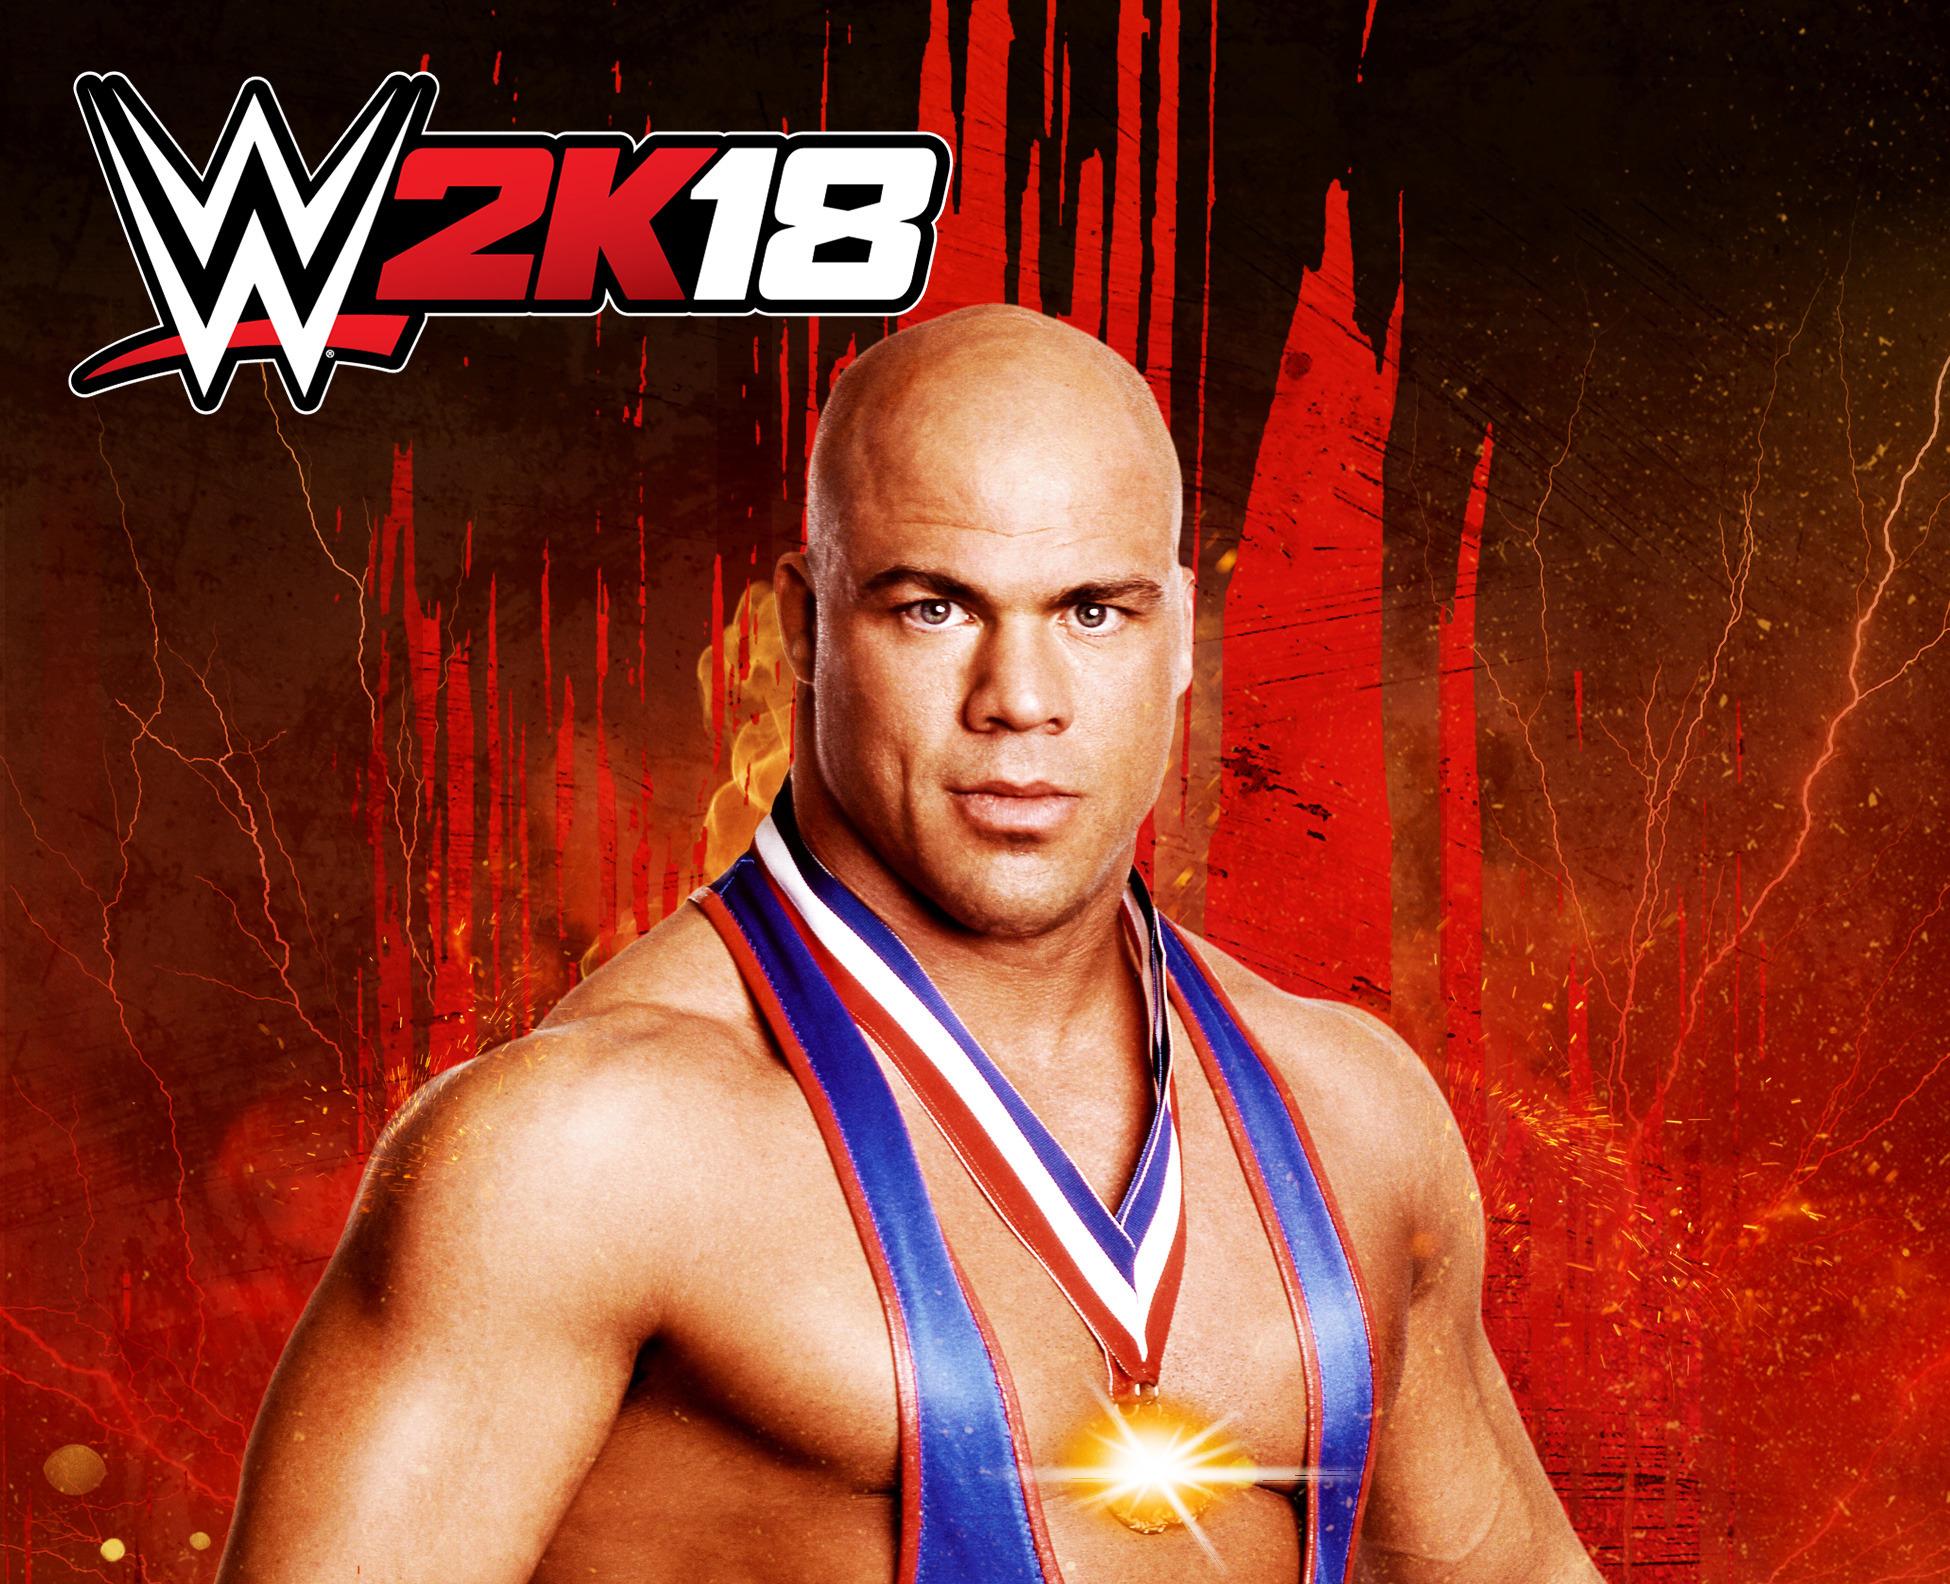 Free Kurt Angle DLC for WWE 2K18 on Nintendo Switch until 13/12